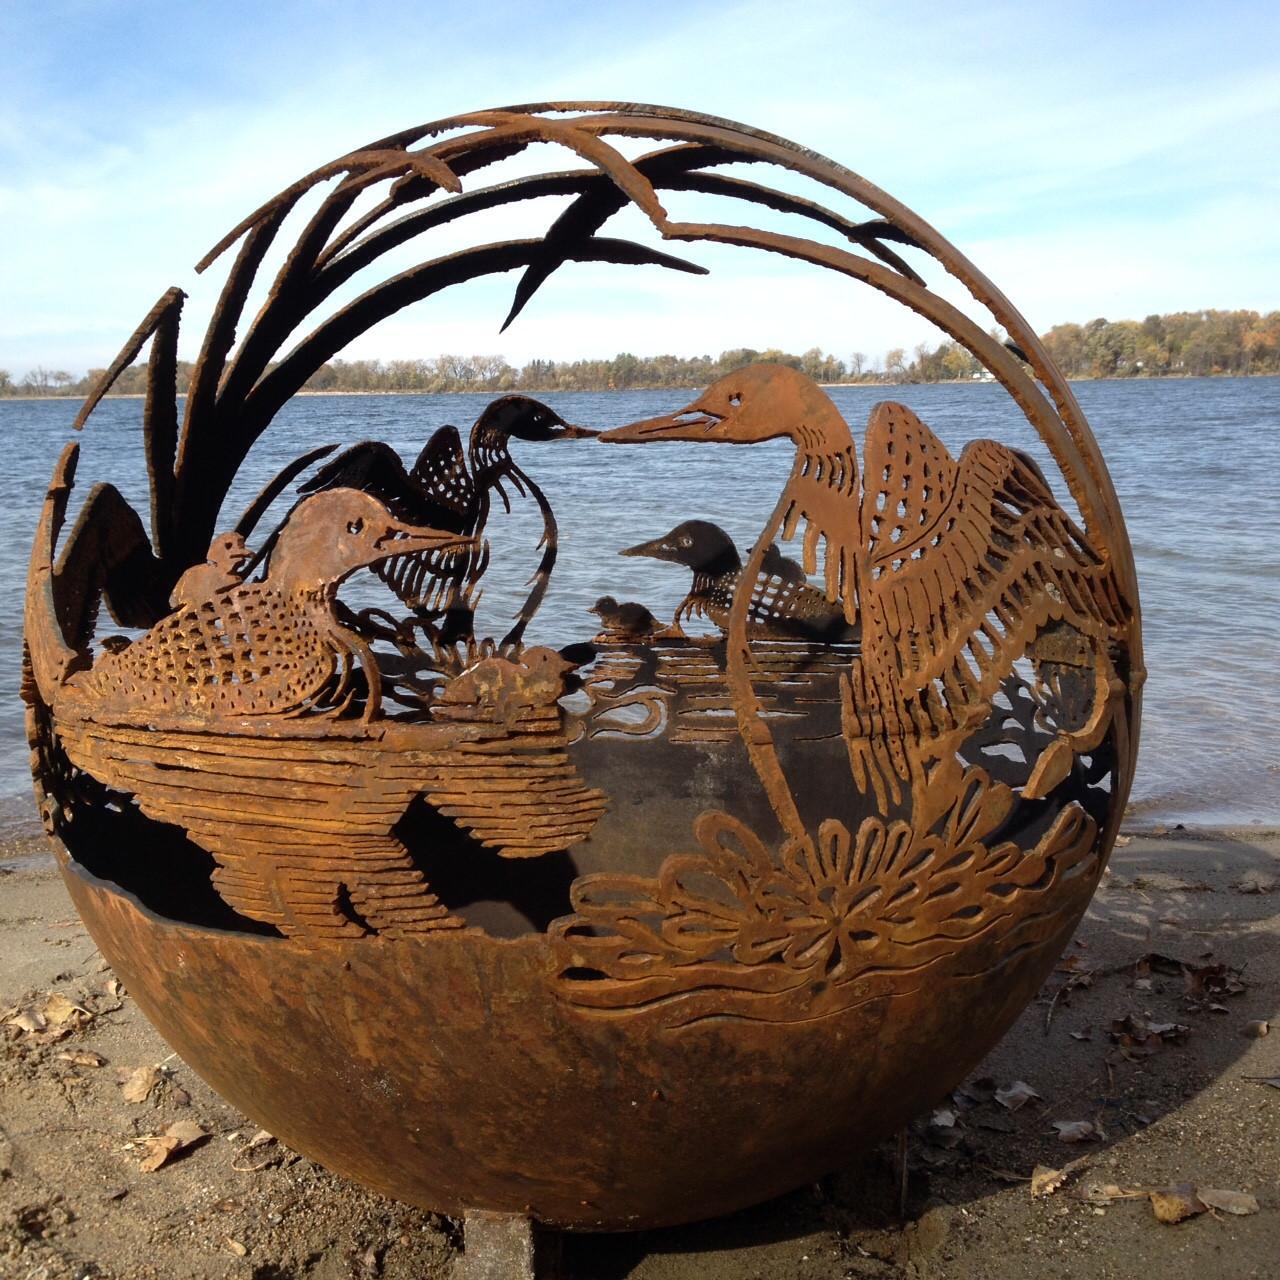 Fireball Fire Pits - Loon - 37.5 inch Fire Globe - Fireball Fire Pits - Loon - 37.5 Inch Fire Globe - 3715DL - The Fire